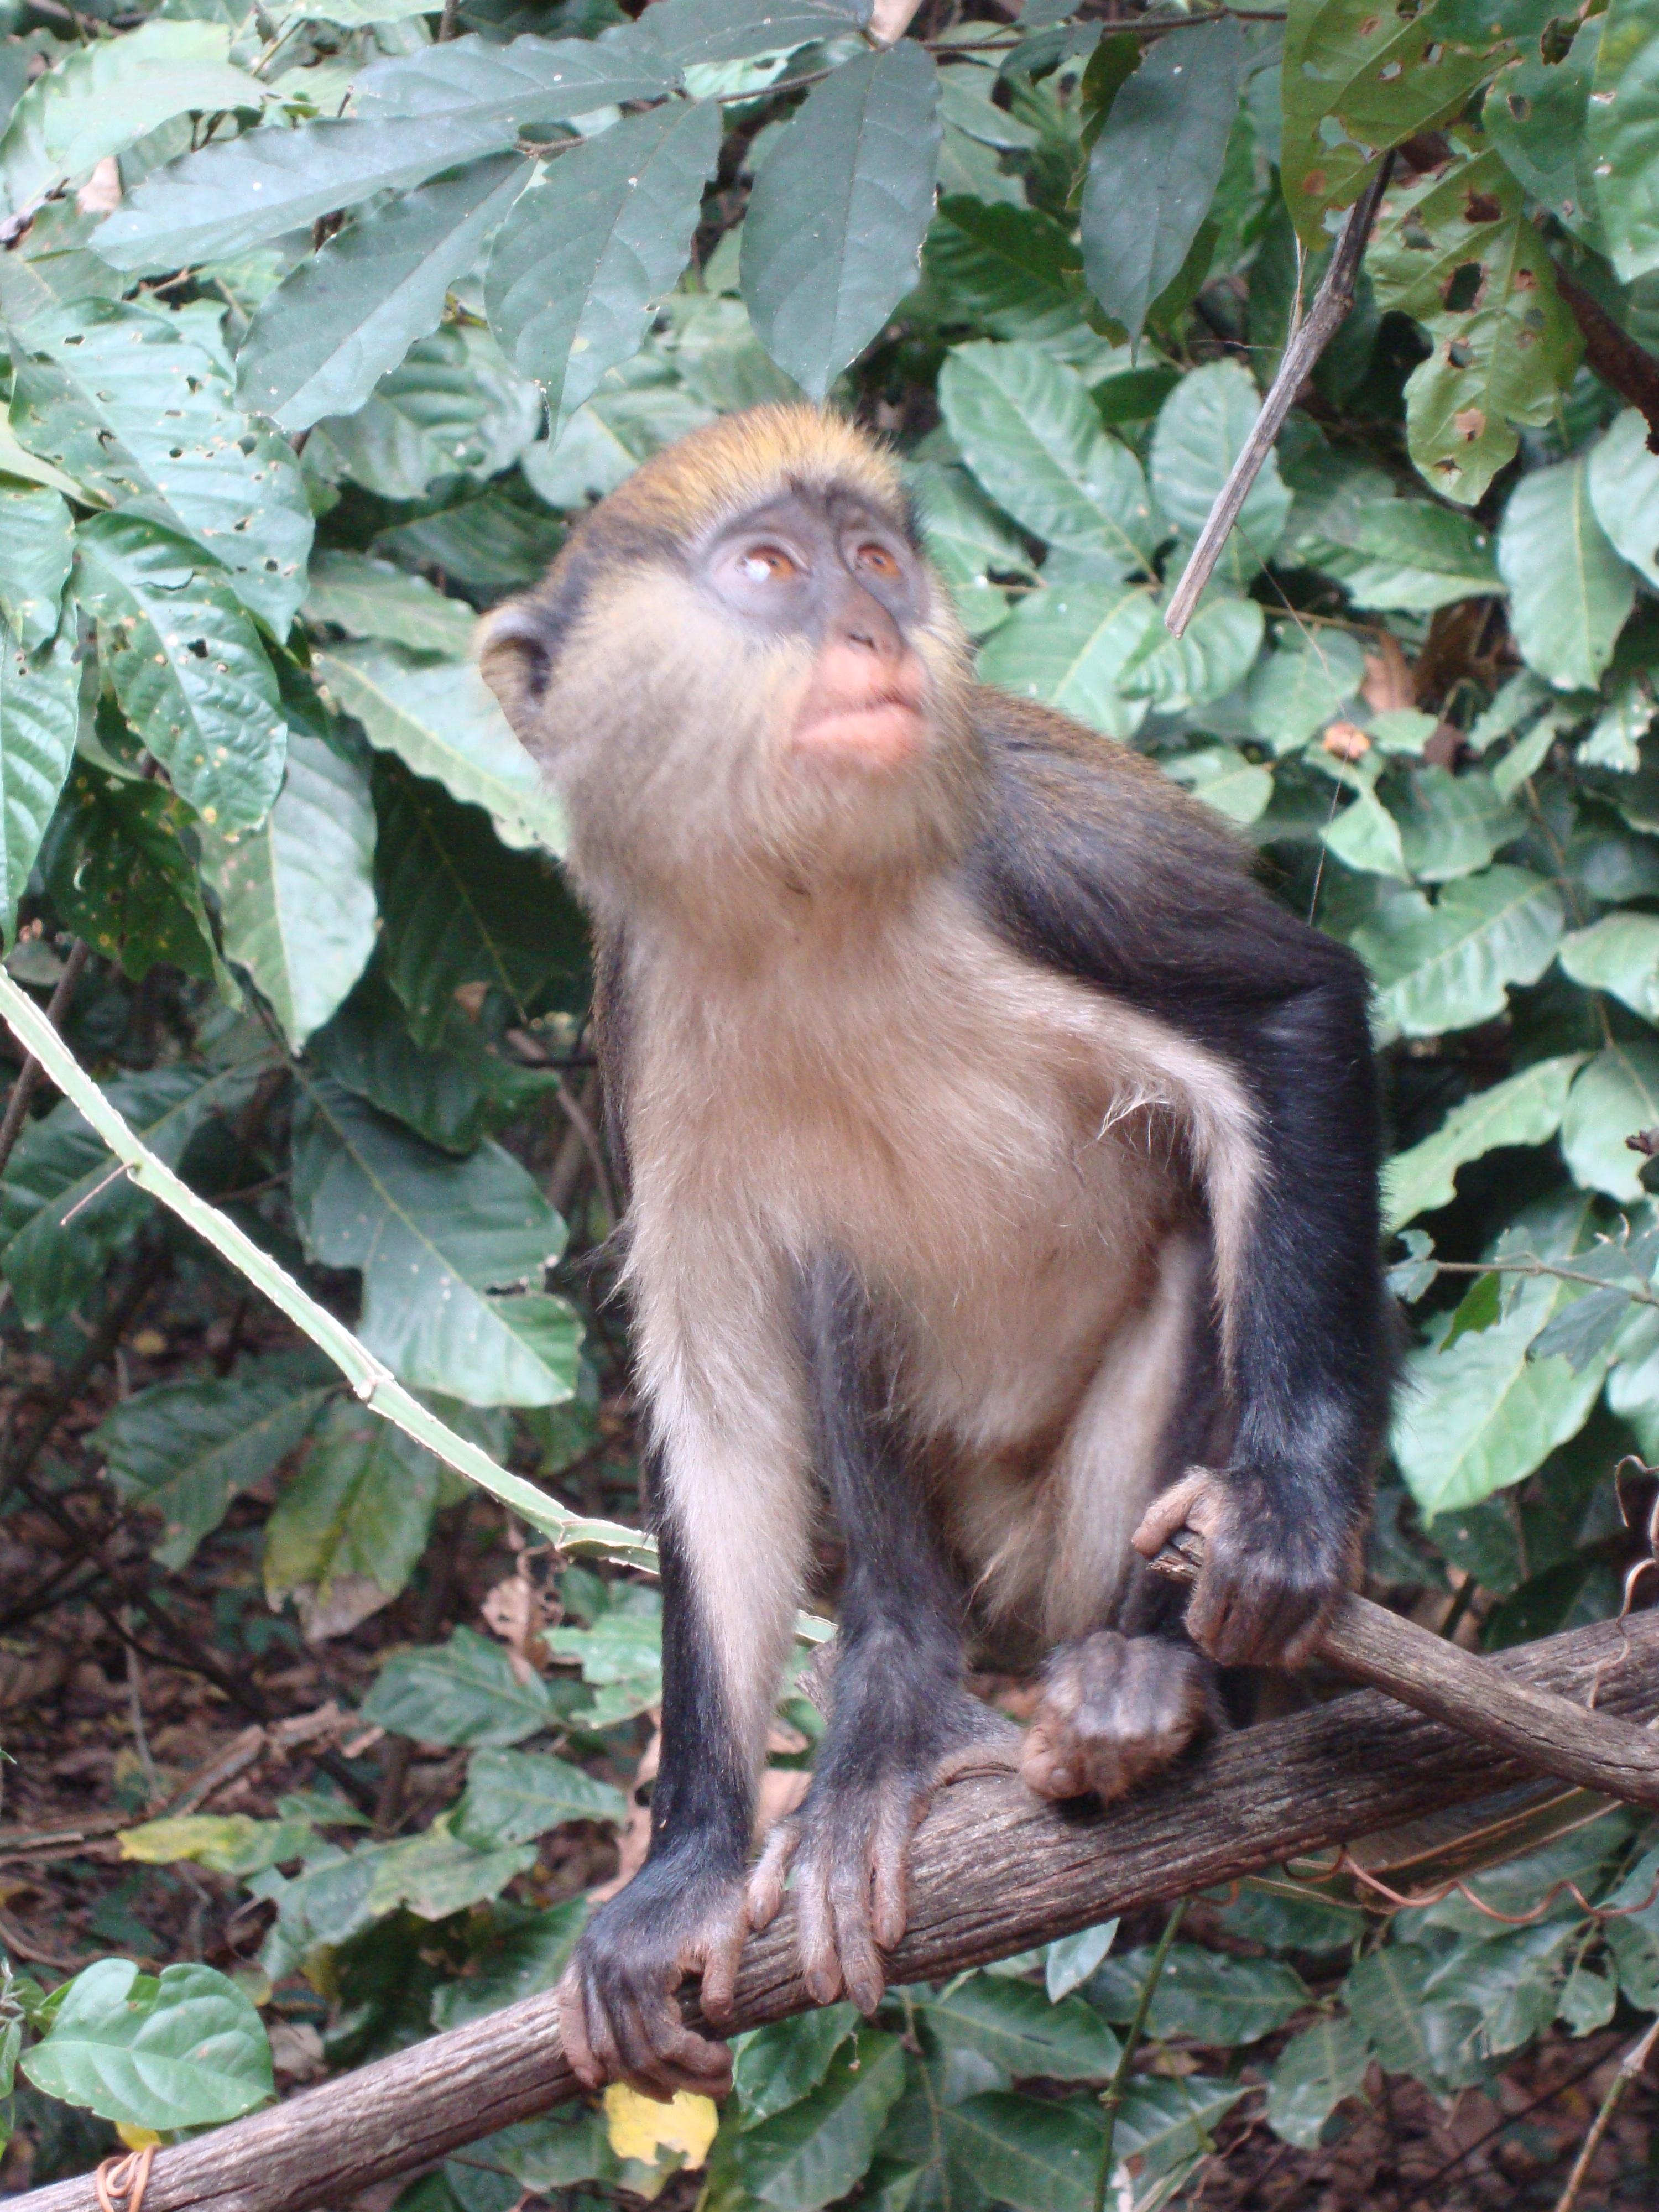 My travels in Ghana so far: January adventures | Steph in Ghana ...